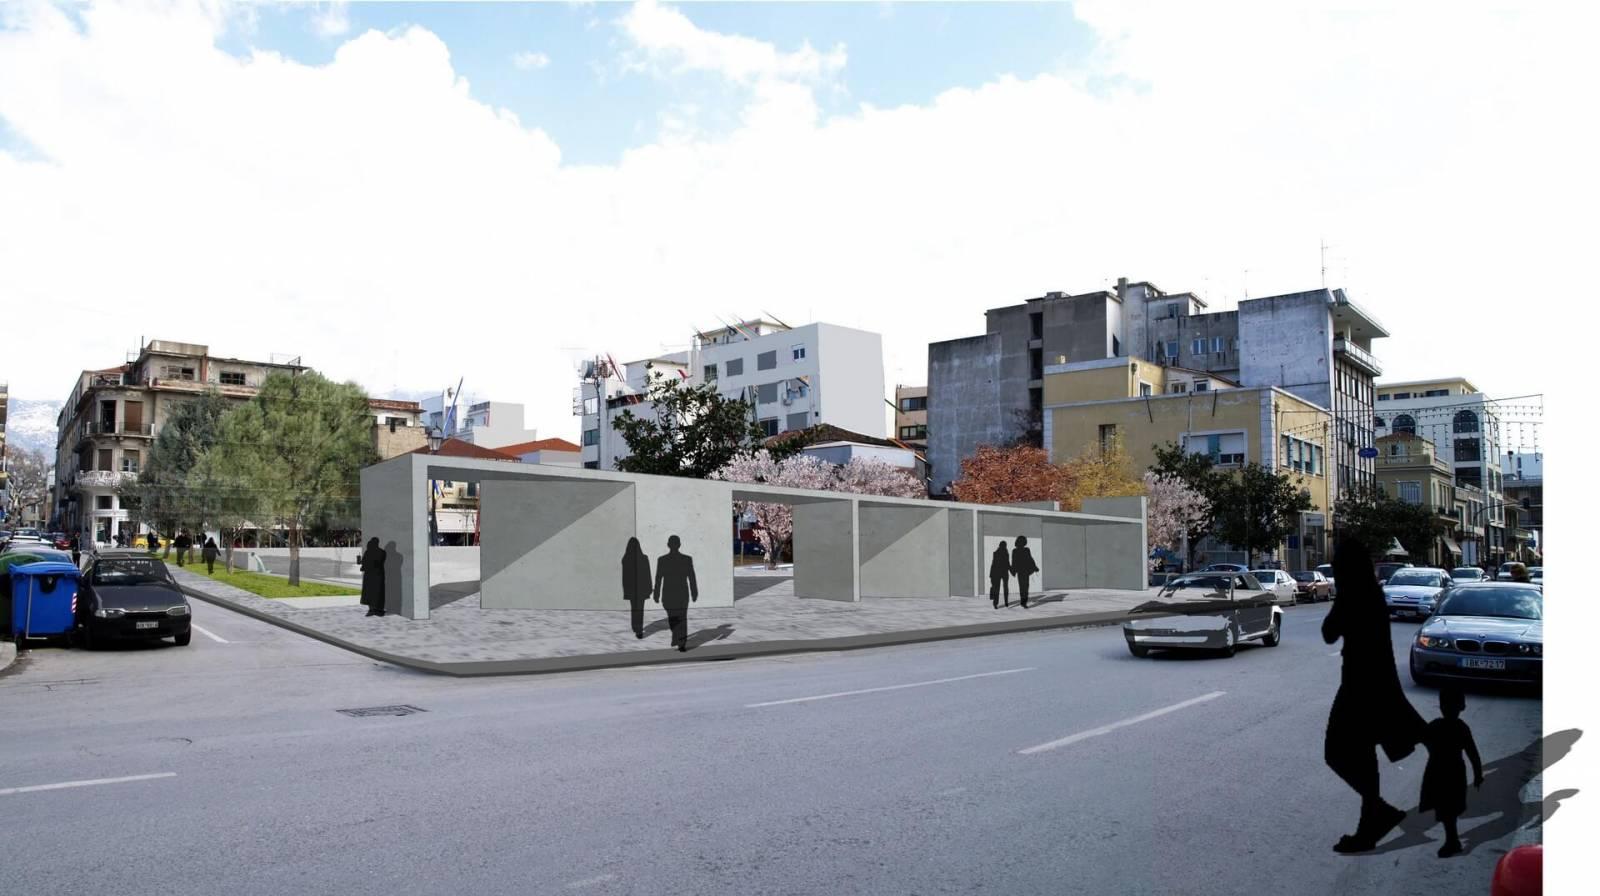 Panepistimiou Square - 5